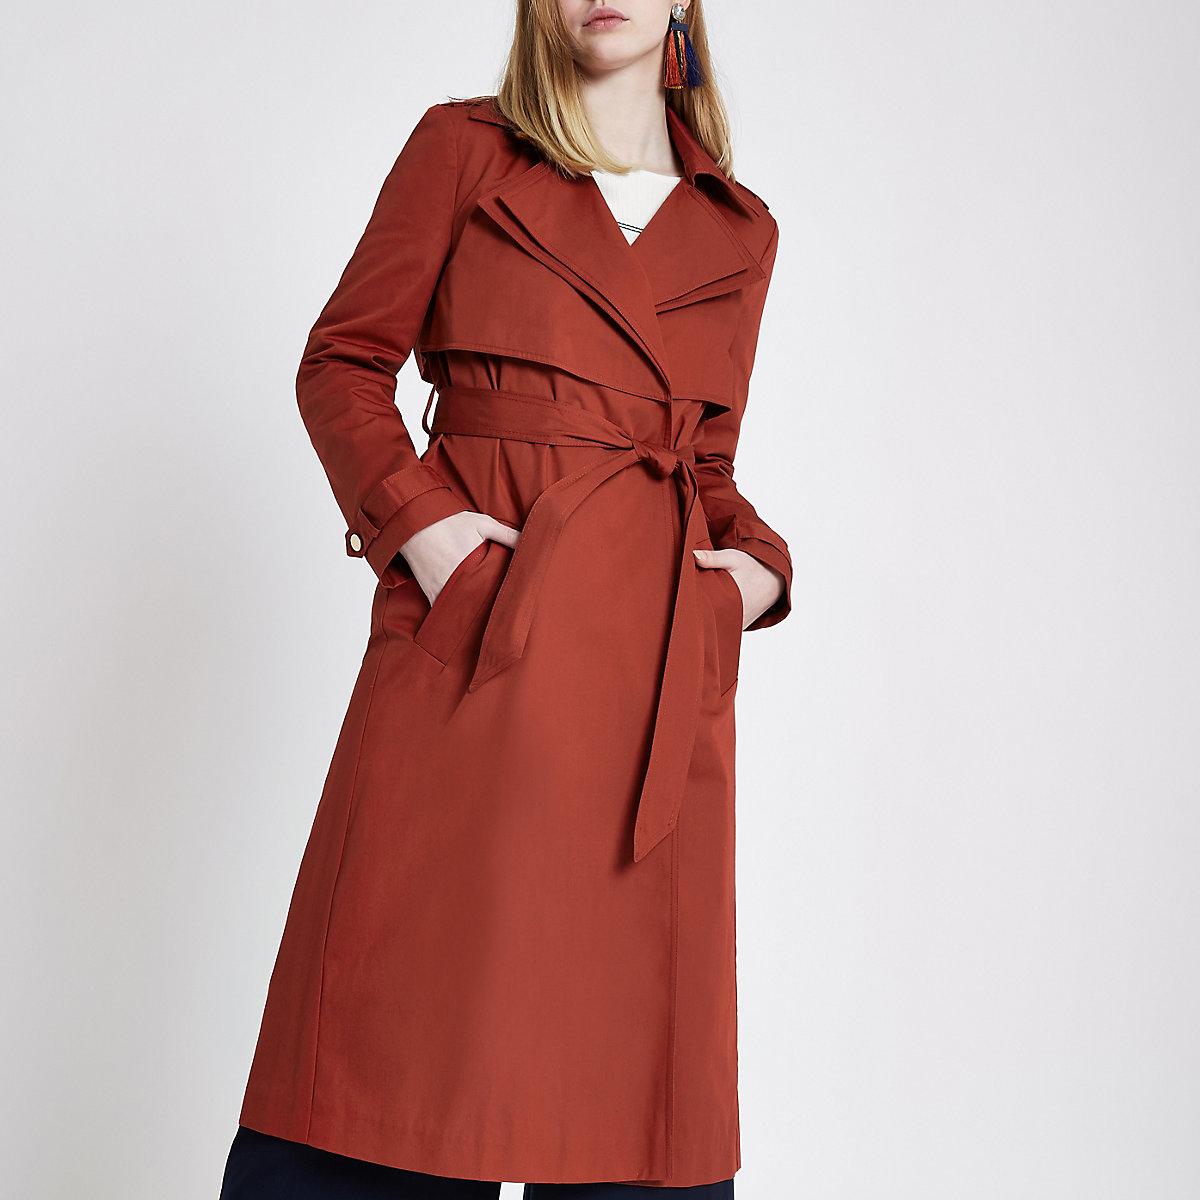 Rust orange double collar belted trench coat